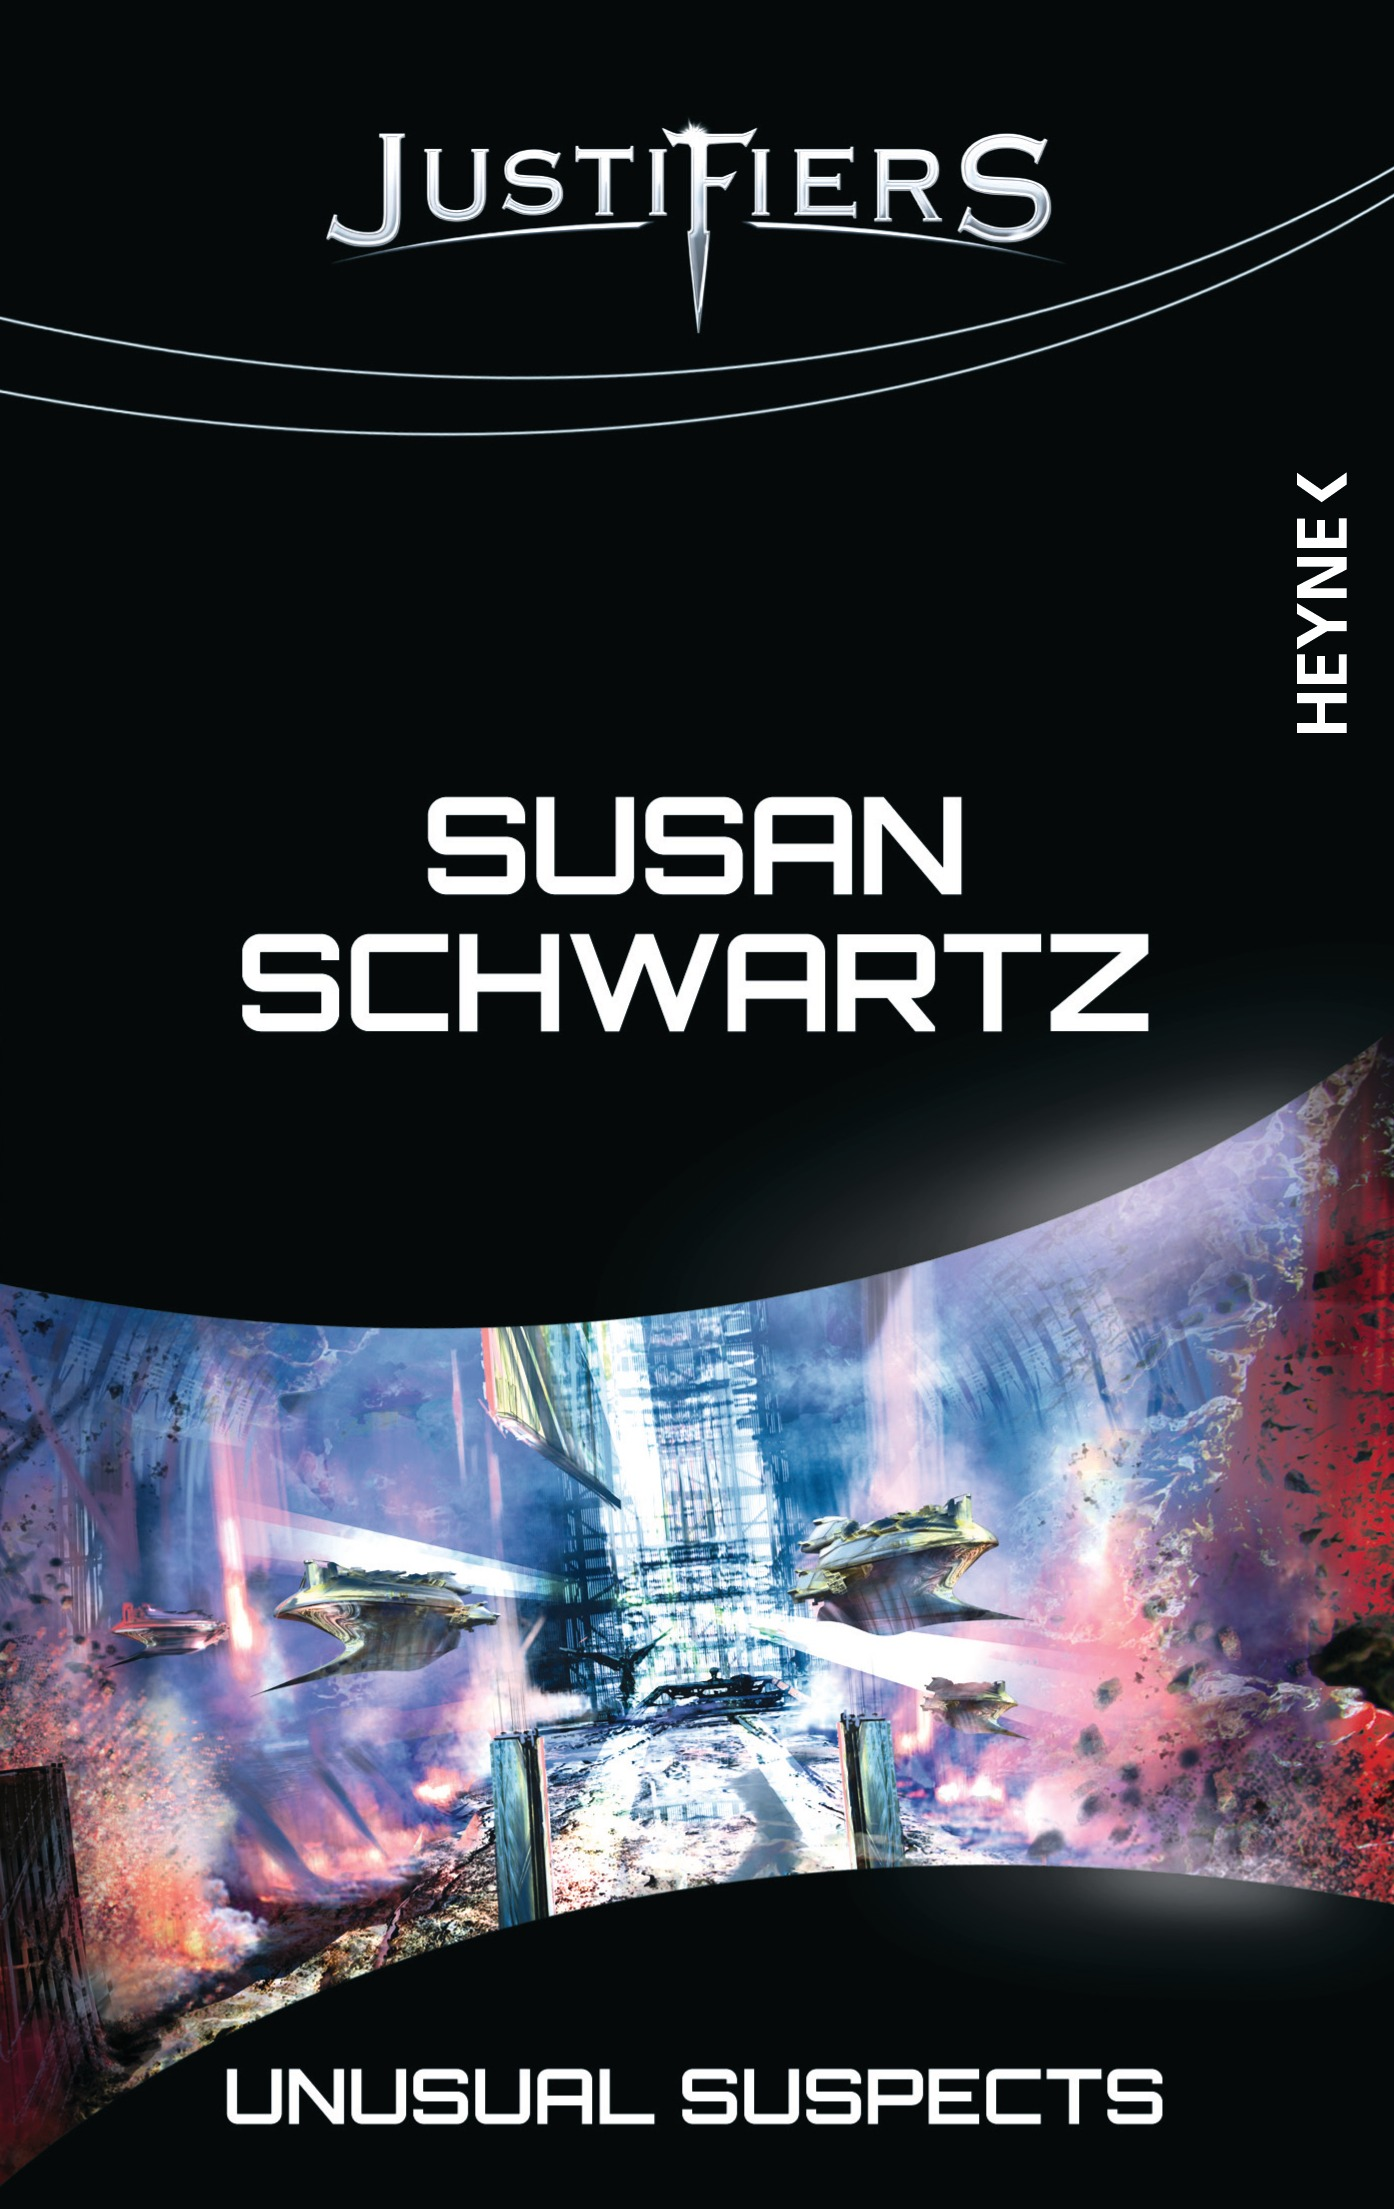 Unusual Suspects: Justifiers-Roman 10 - Susan Schwartz